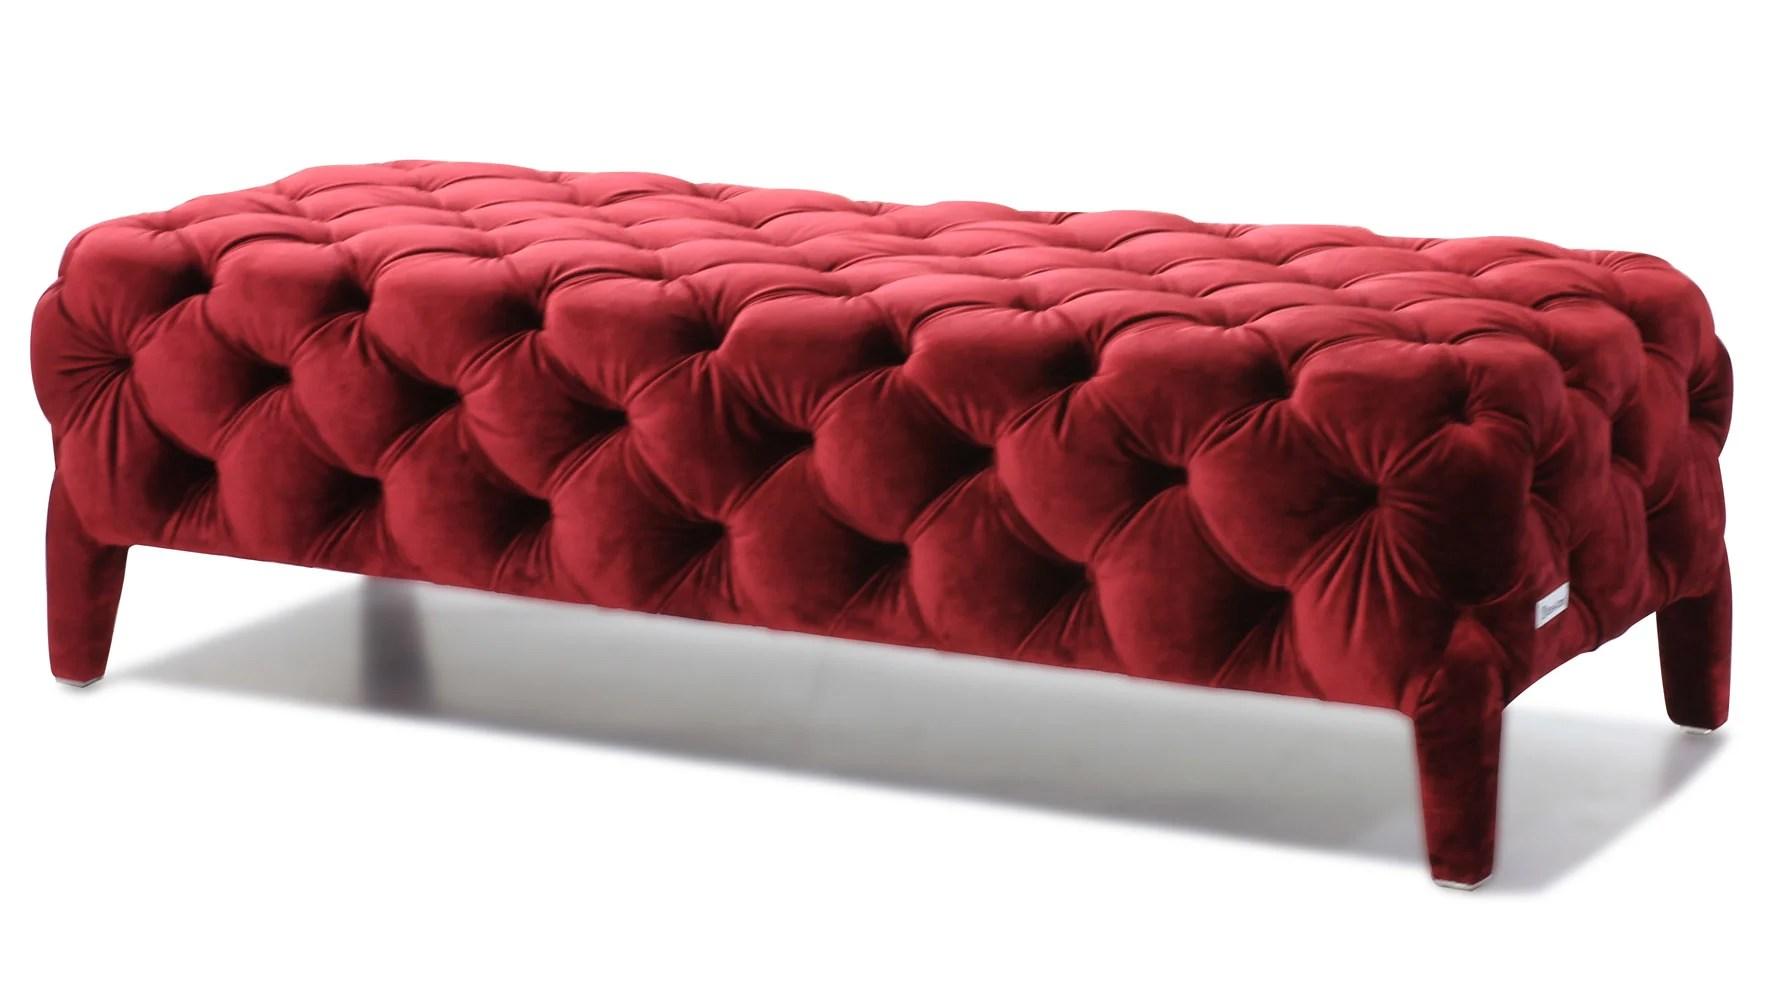 Modern Red Velour Tufted Oslo Bedroom Bench  Zuri Furniture